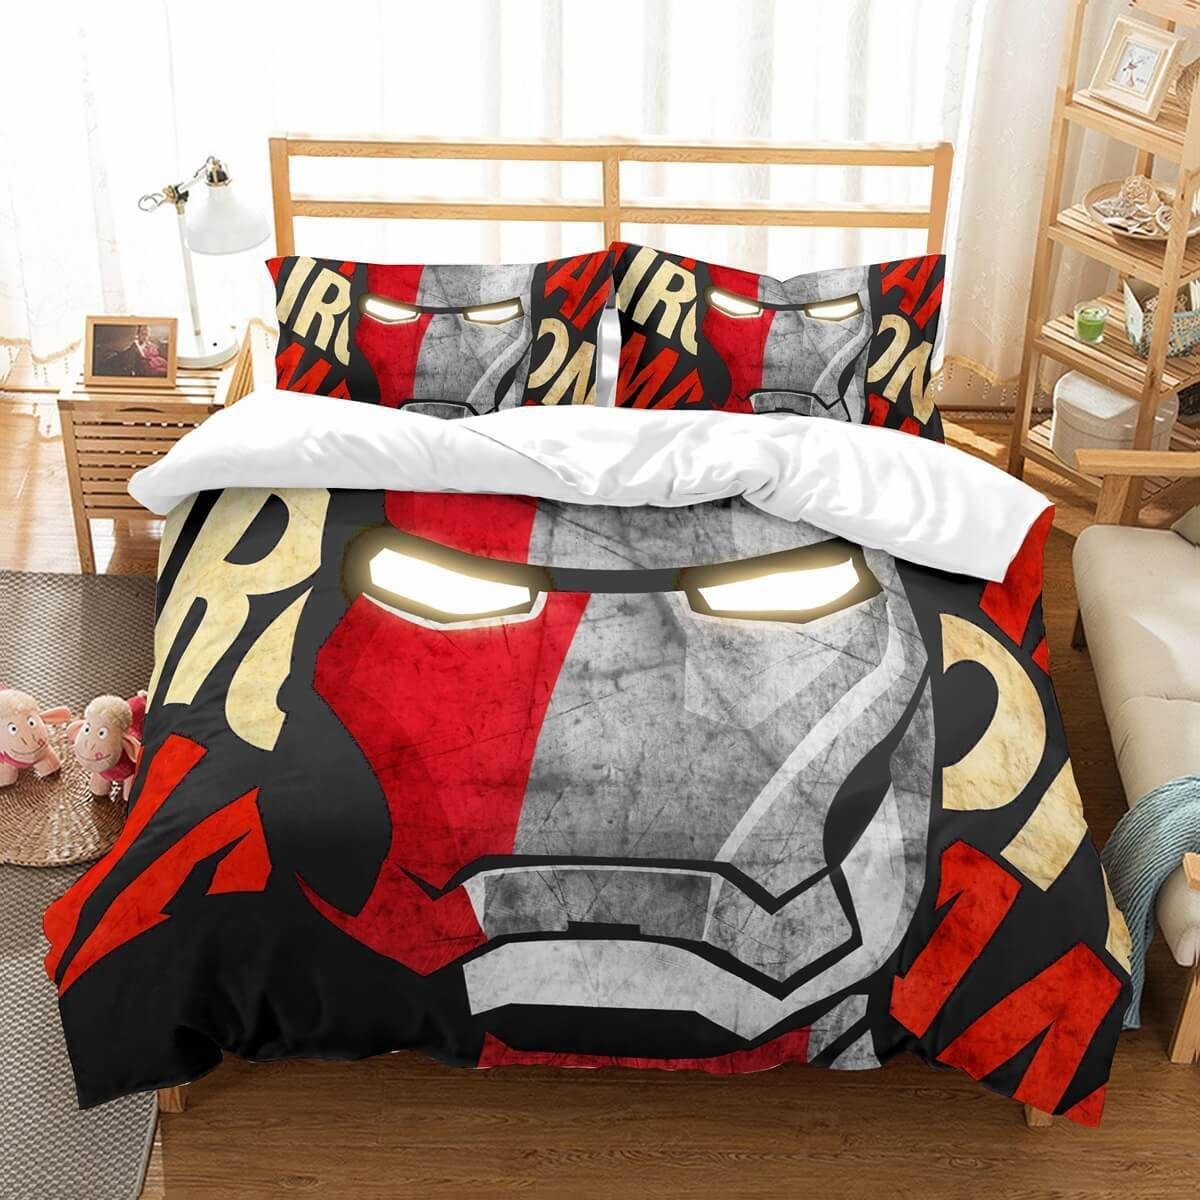 3d Customize Iron Man Bedding Set Duvet Cover Set Bedroom Set Bedlinen Westbedding Mens Bedding Sets Duvet Cover Sets Bedroom Set